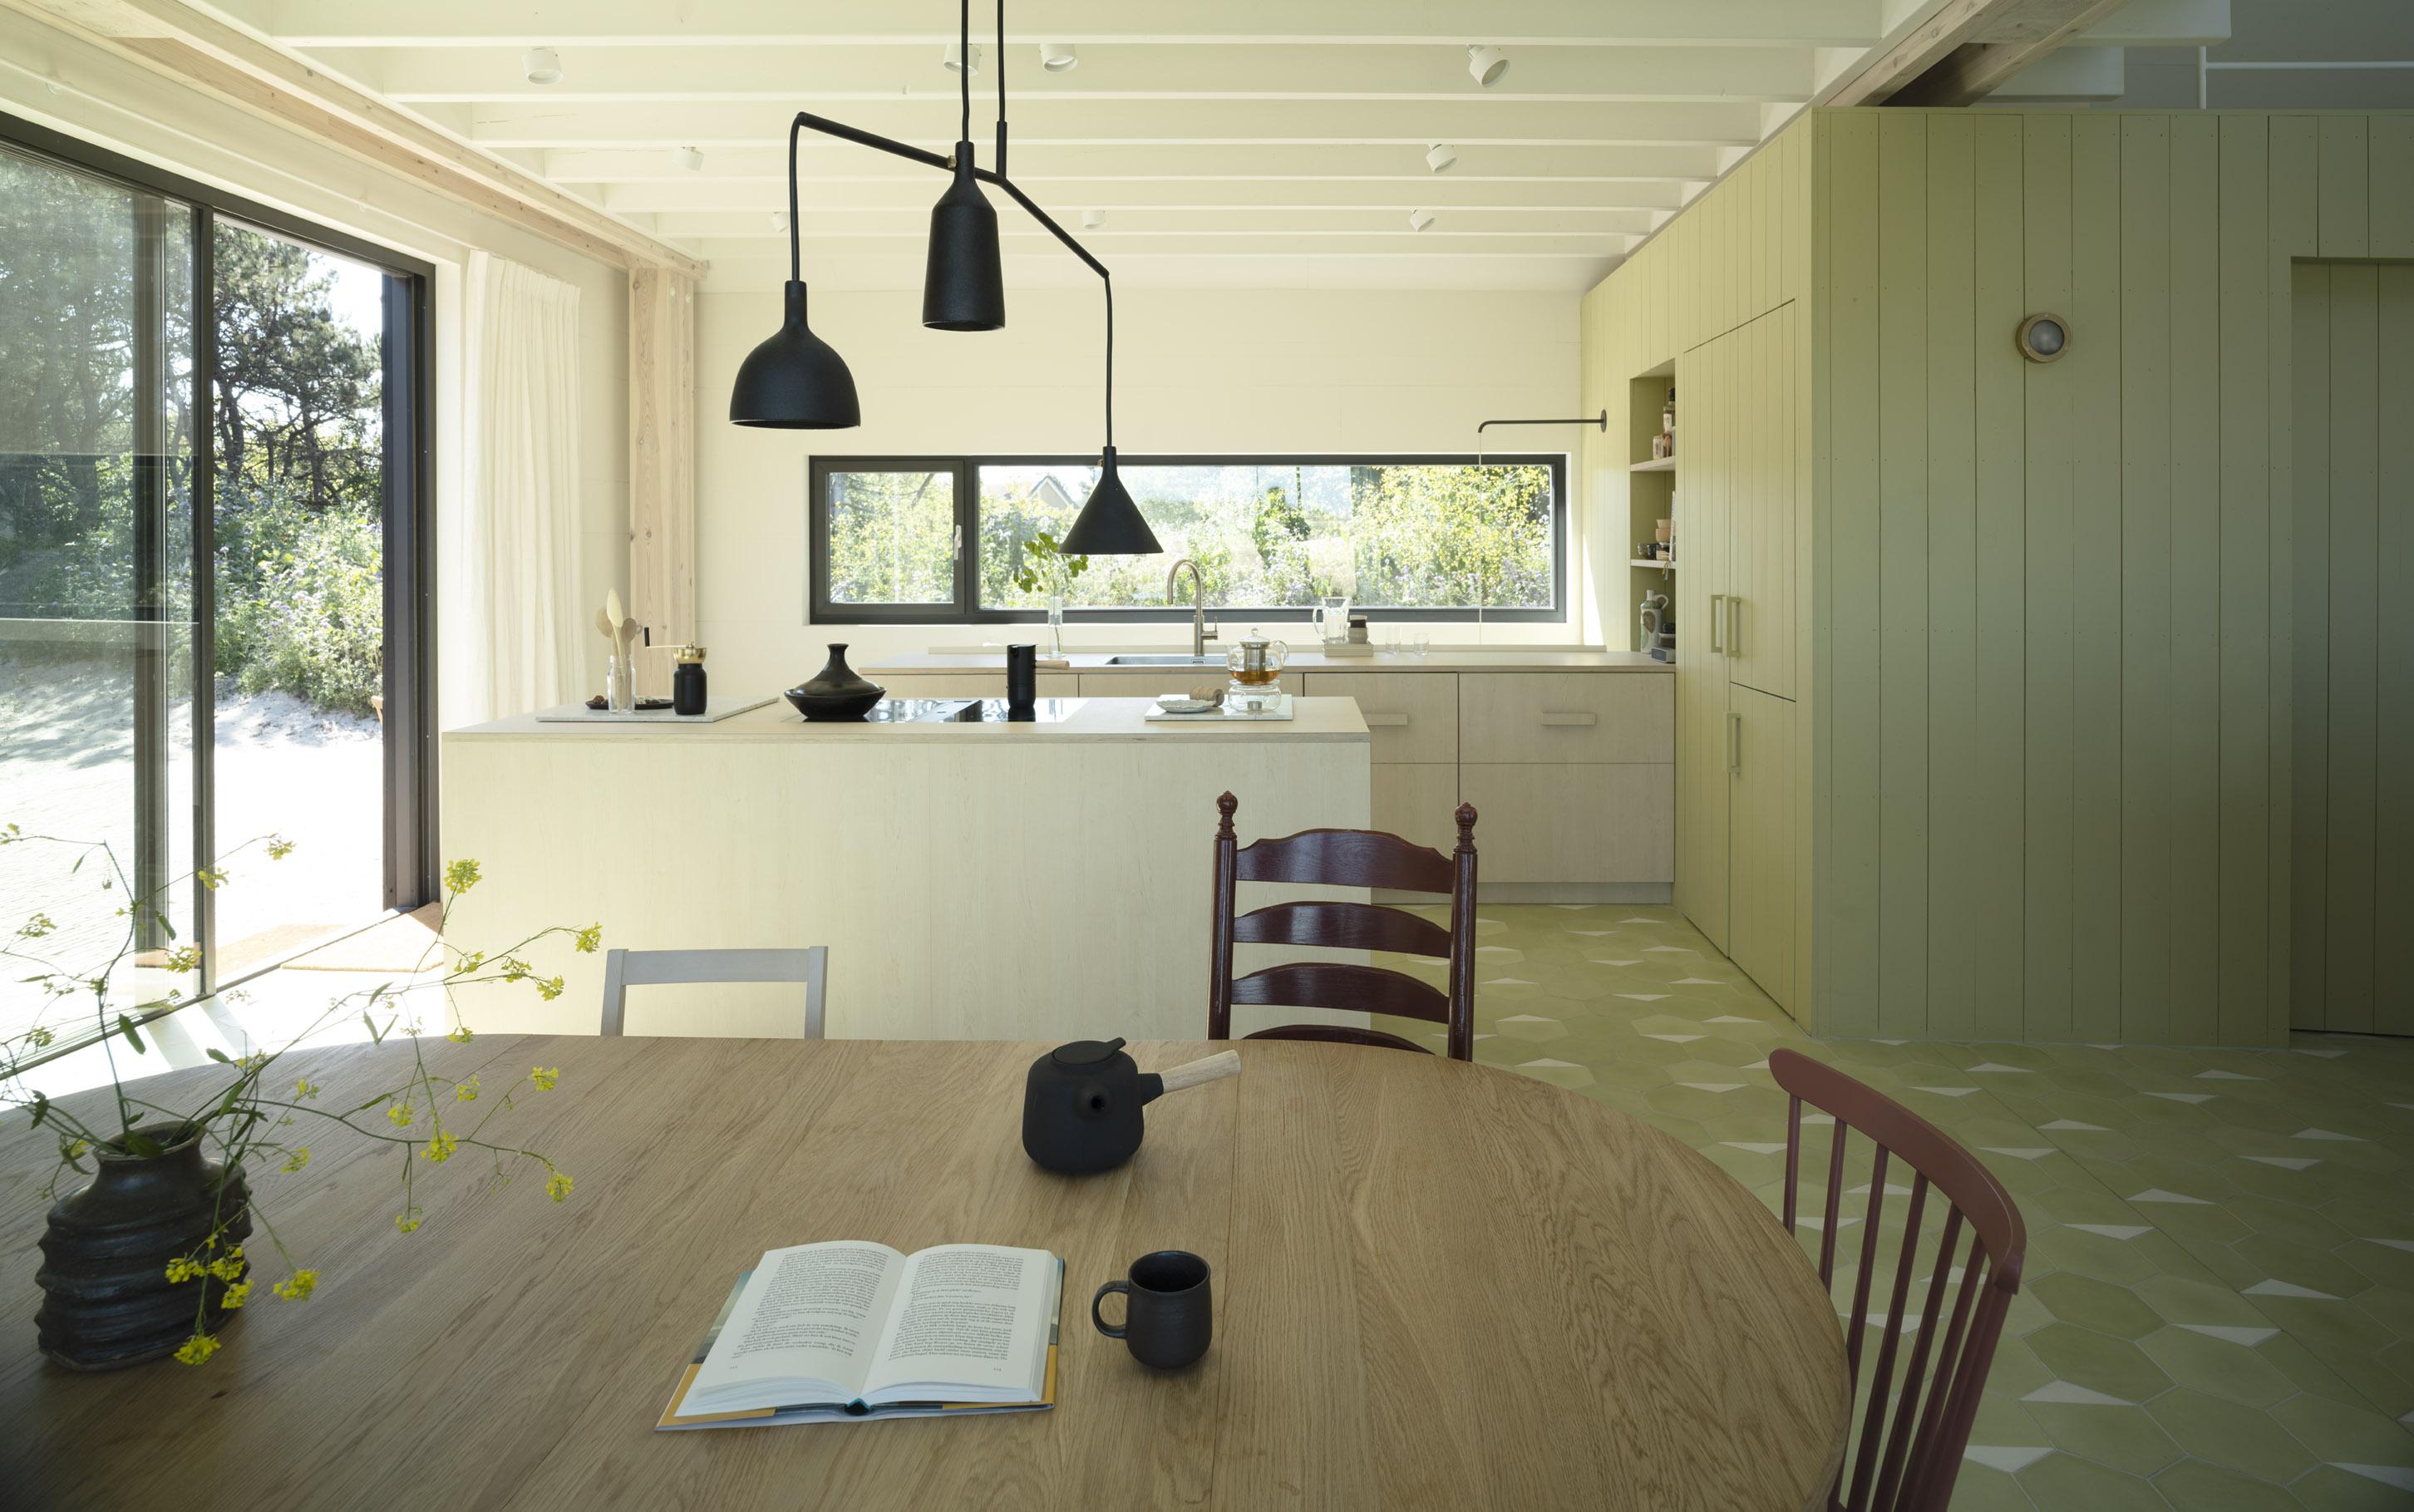 <p>Duinhuis Ameland &#8211; INAMATT &#8211; keuken &#8211; foto: Arjan Benning</p>